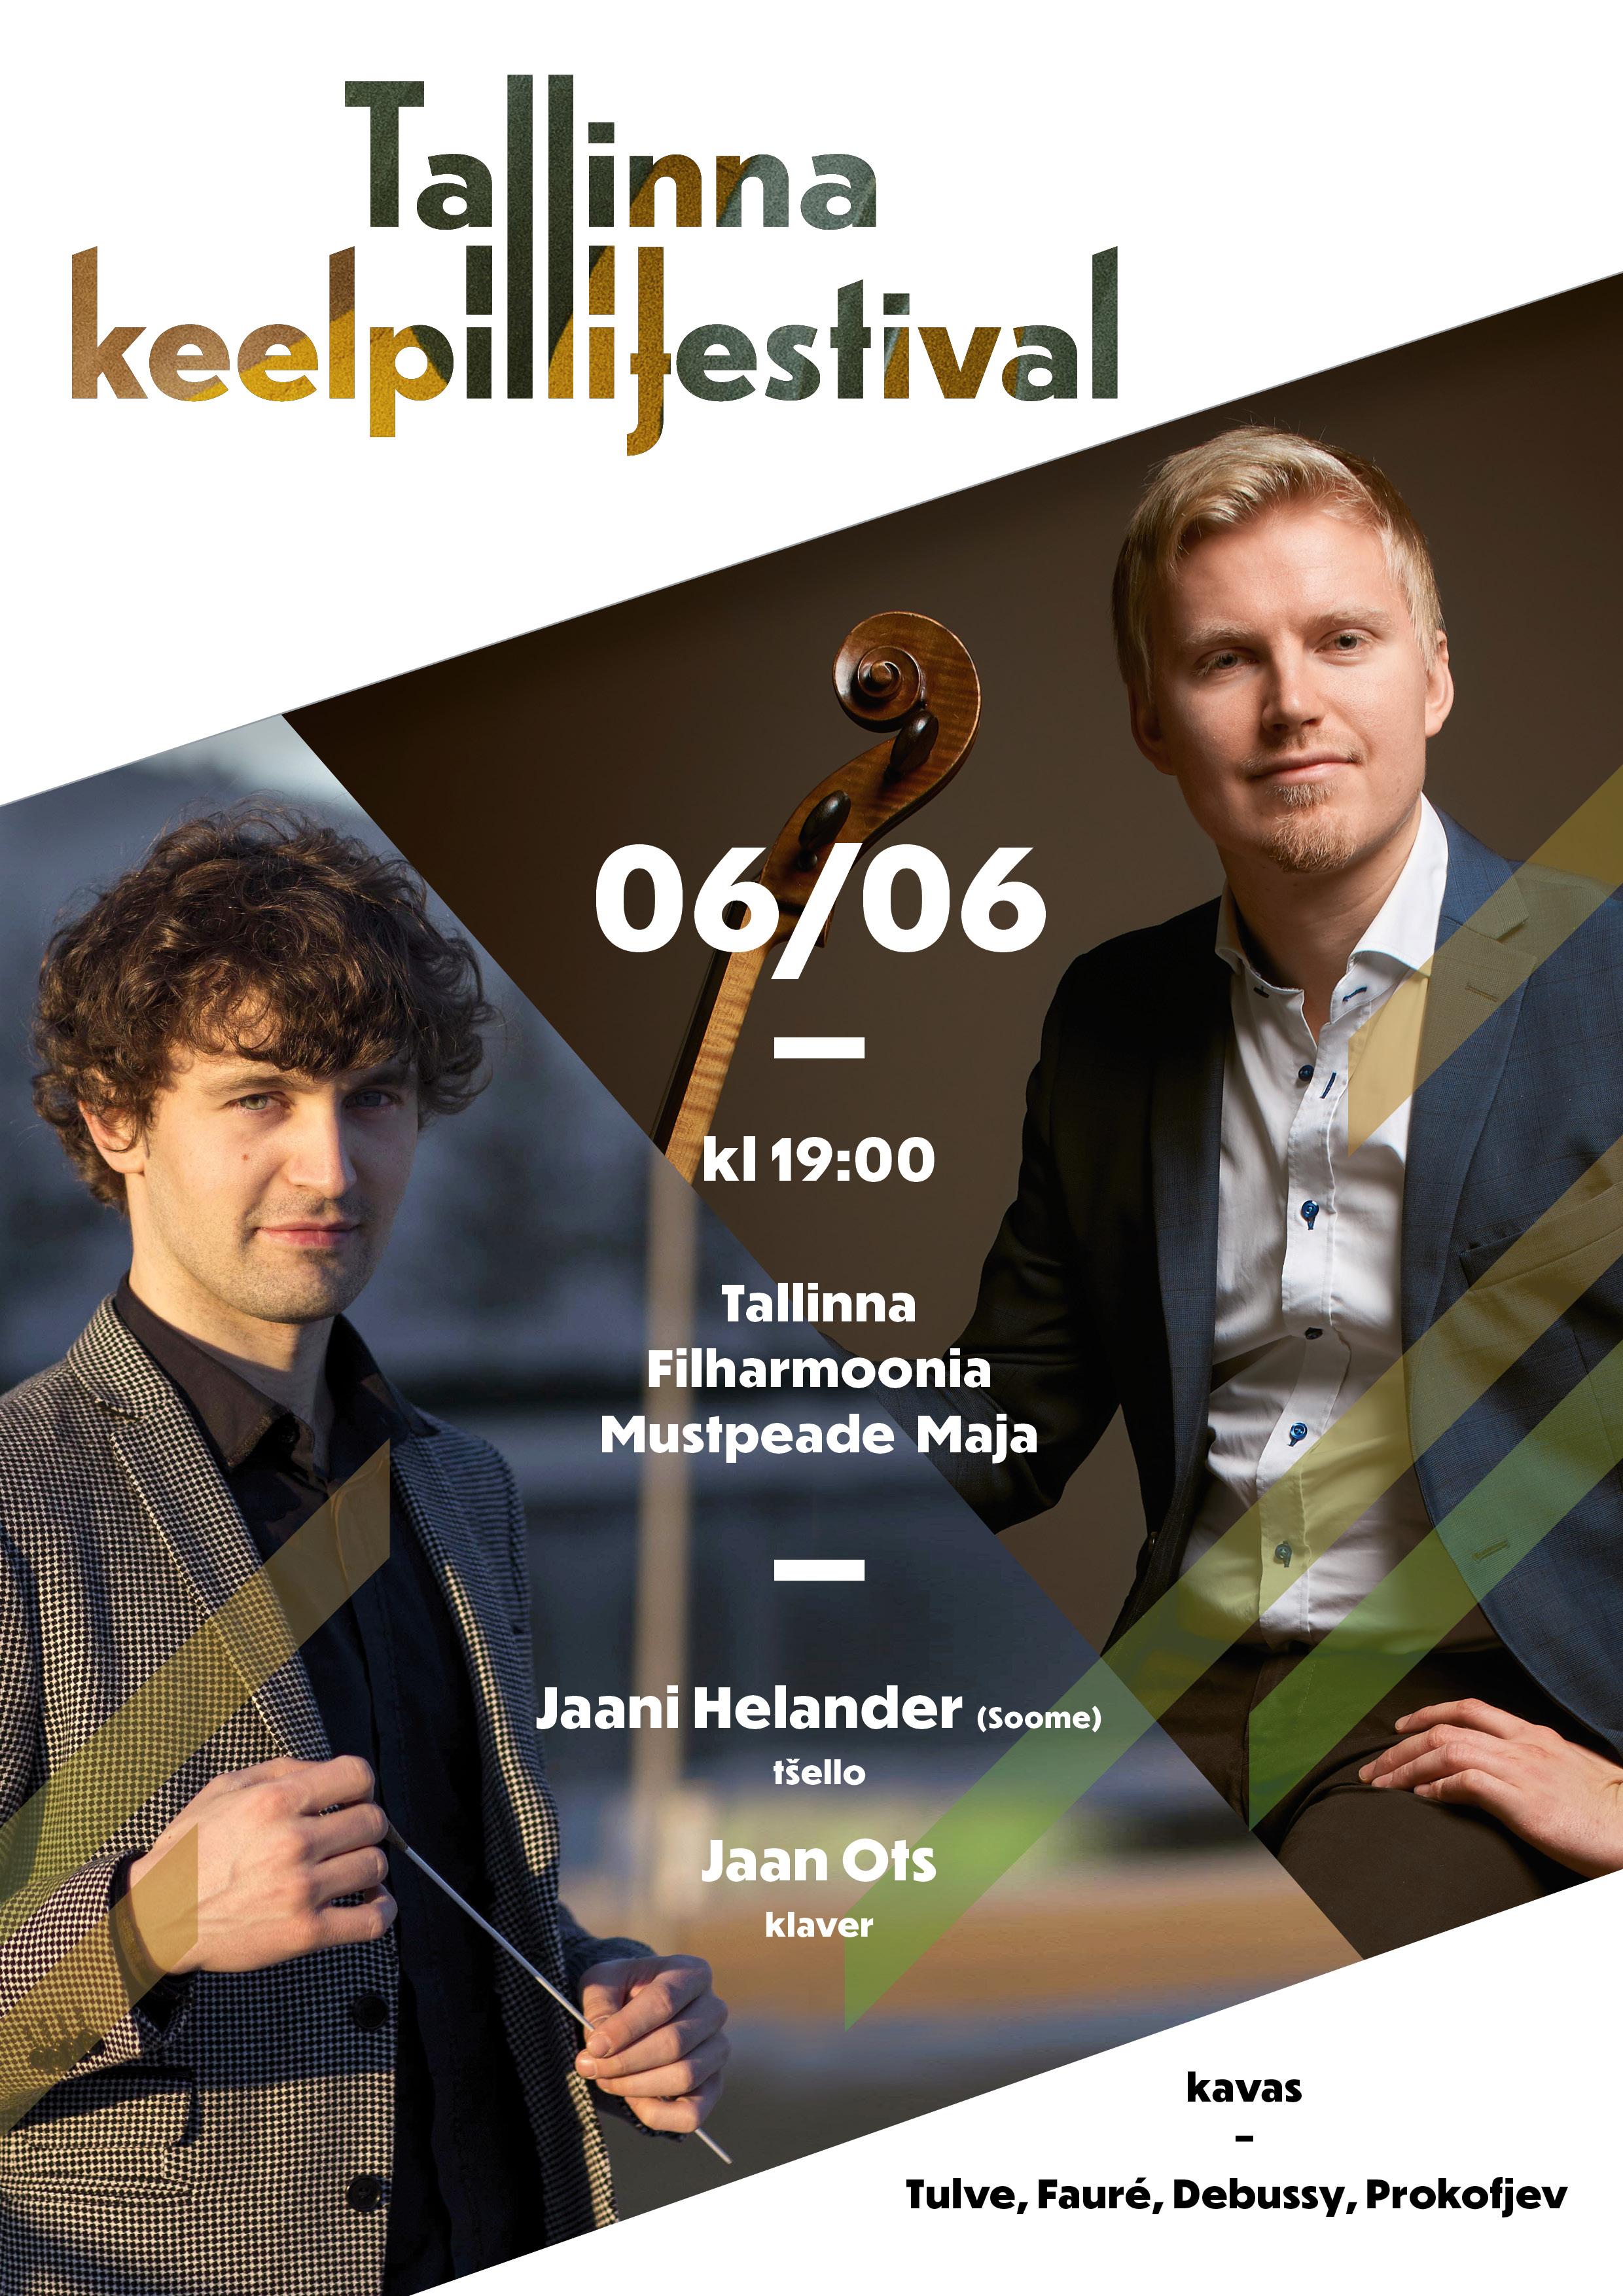 Jaani Helander (tšello, Soome), Jaan Ots (klaver) / Tallinna Keelpillifestival